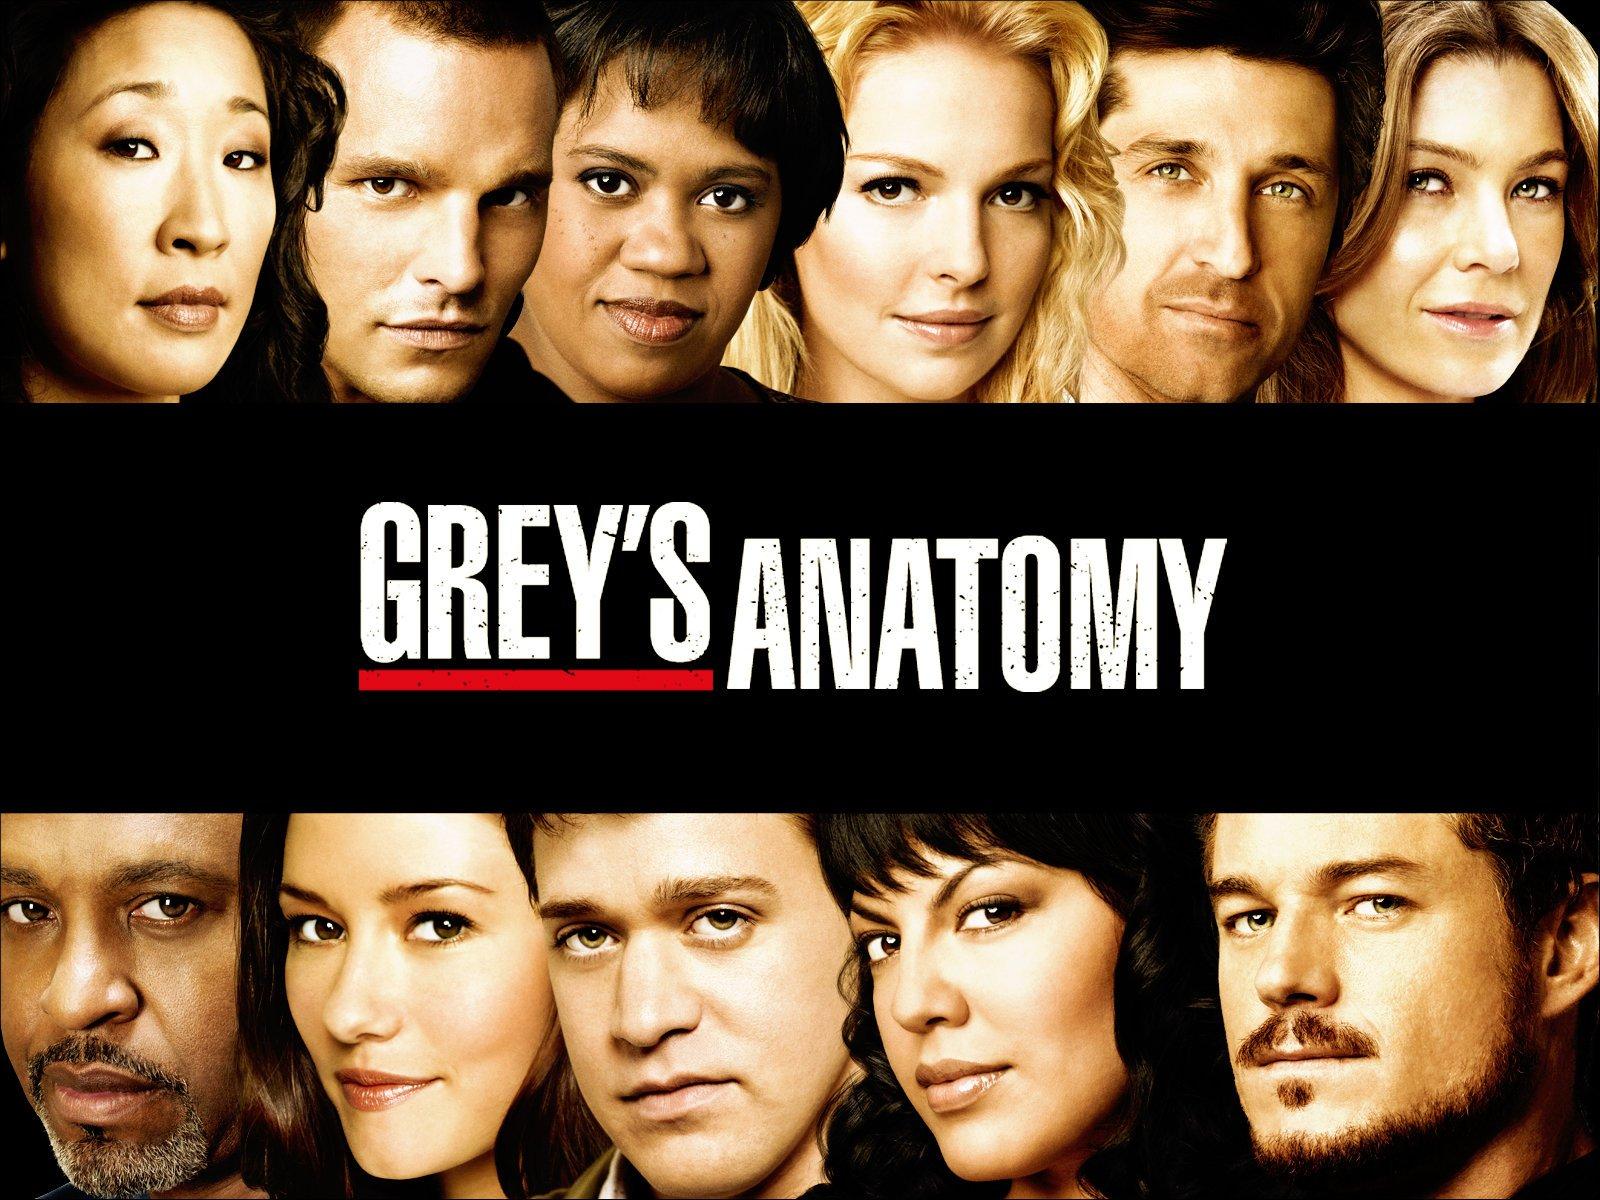 Amazon Watch Greys Anatomy Season 4 Prime Video